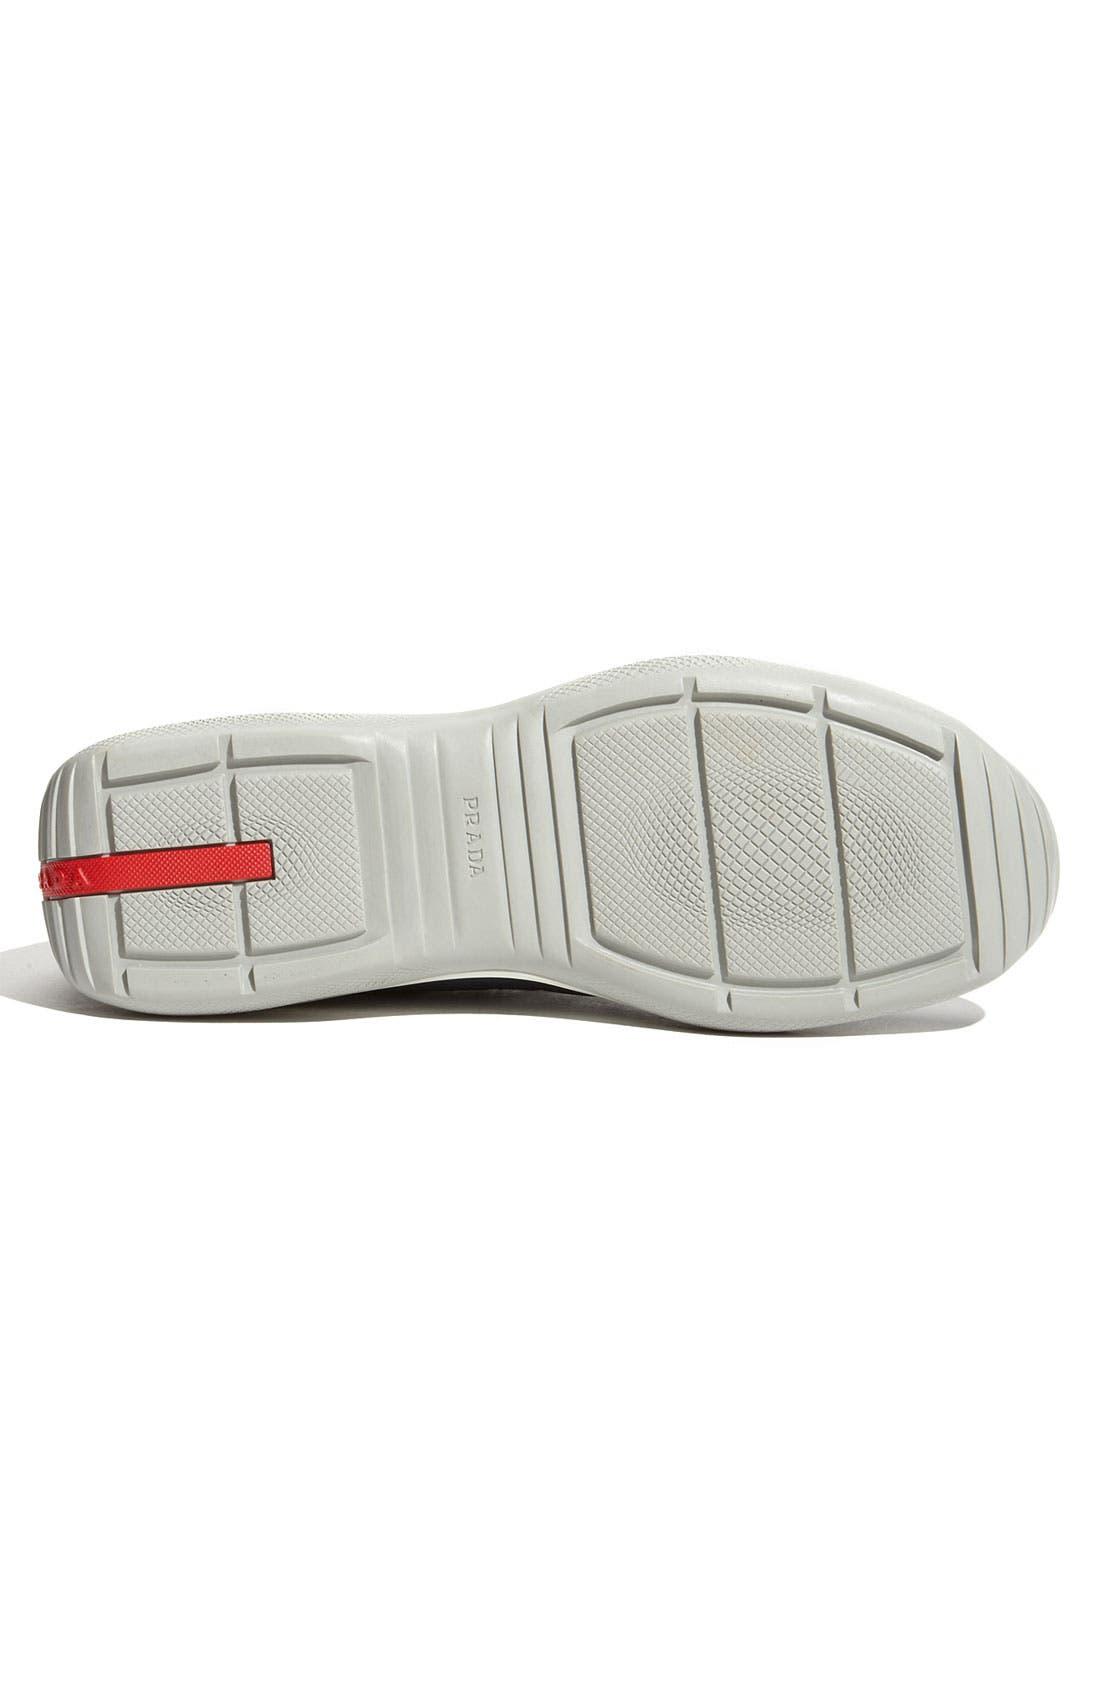 Alternate Image 3  - Prada 'Eagle' Lace-Up Sneaker (Men)